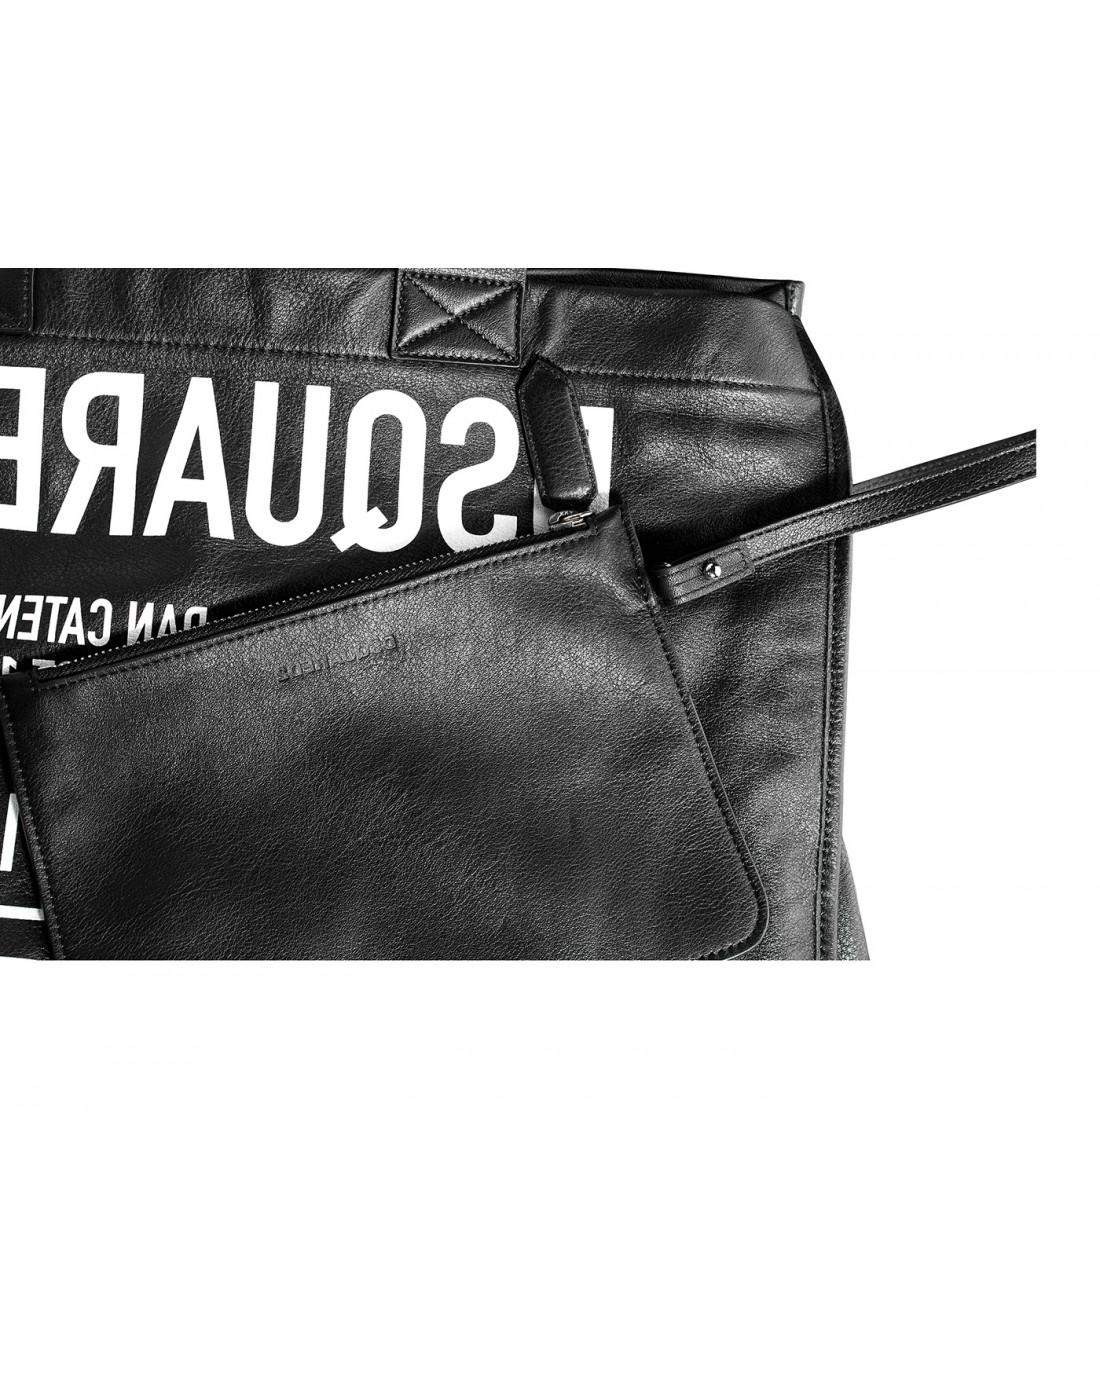 Сумка-шопер черная женская Dsquared2 SSPW0022.M063-4